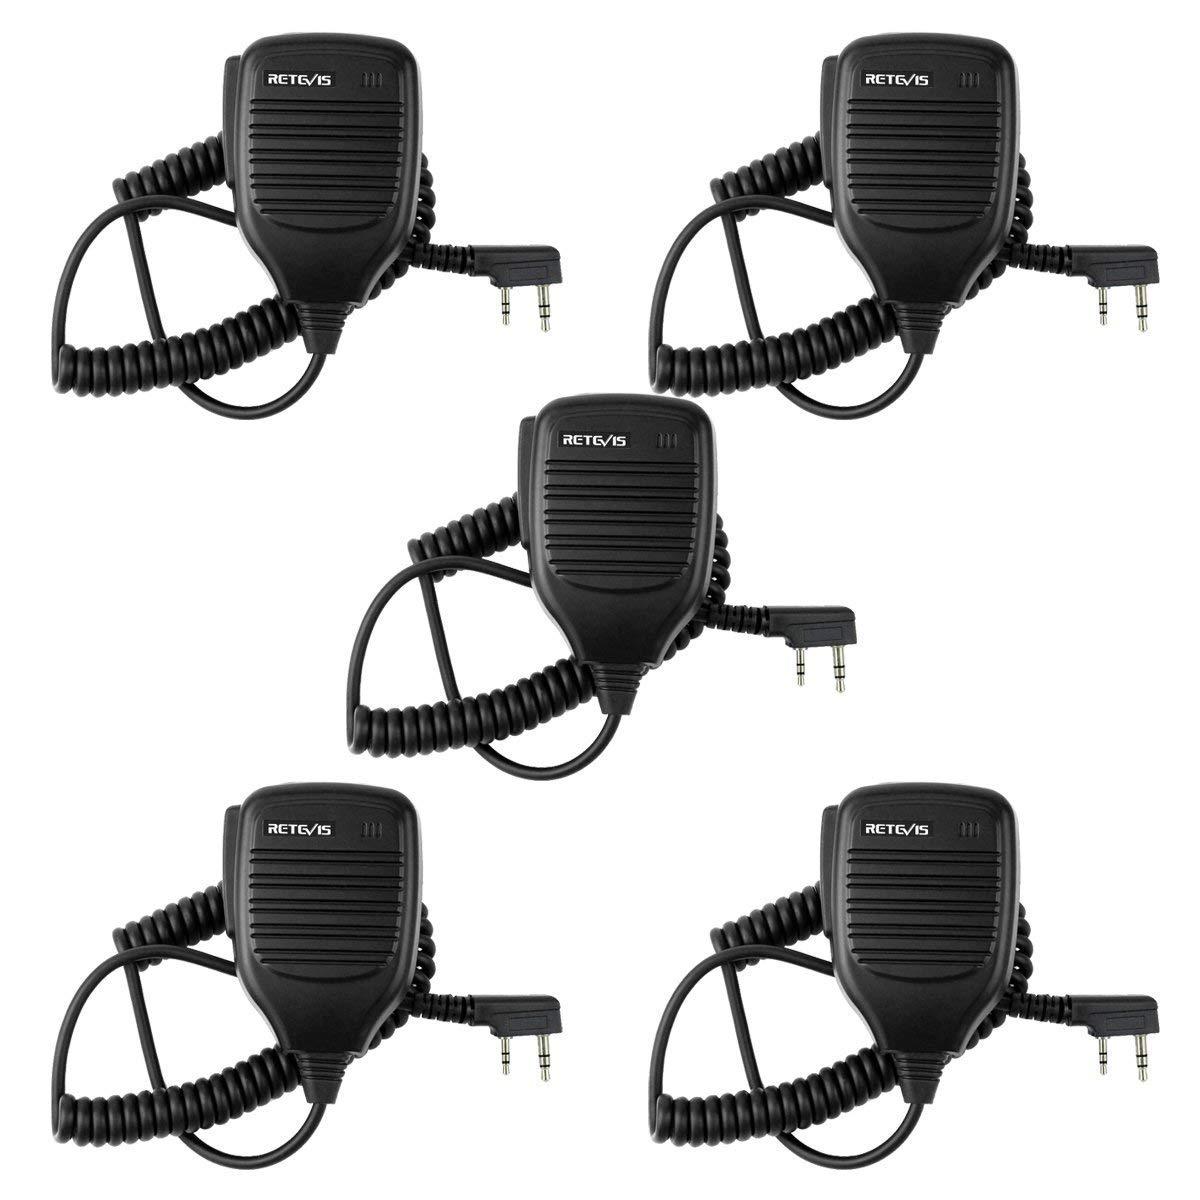 Retevis 2 Pin Handheld Remote Speaker Mic for Kenwood/Baofeng UV-5R/UV-5RA/888S Retevis RT27/H777/R888s/RT-5R/RT-6S Walkie Talkies (5 Pack) CAC9001A5